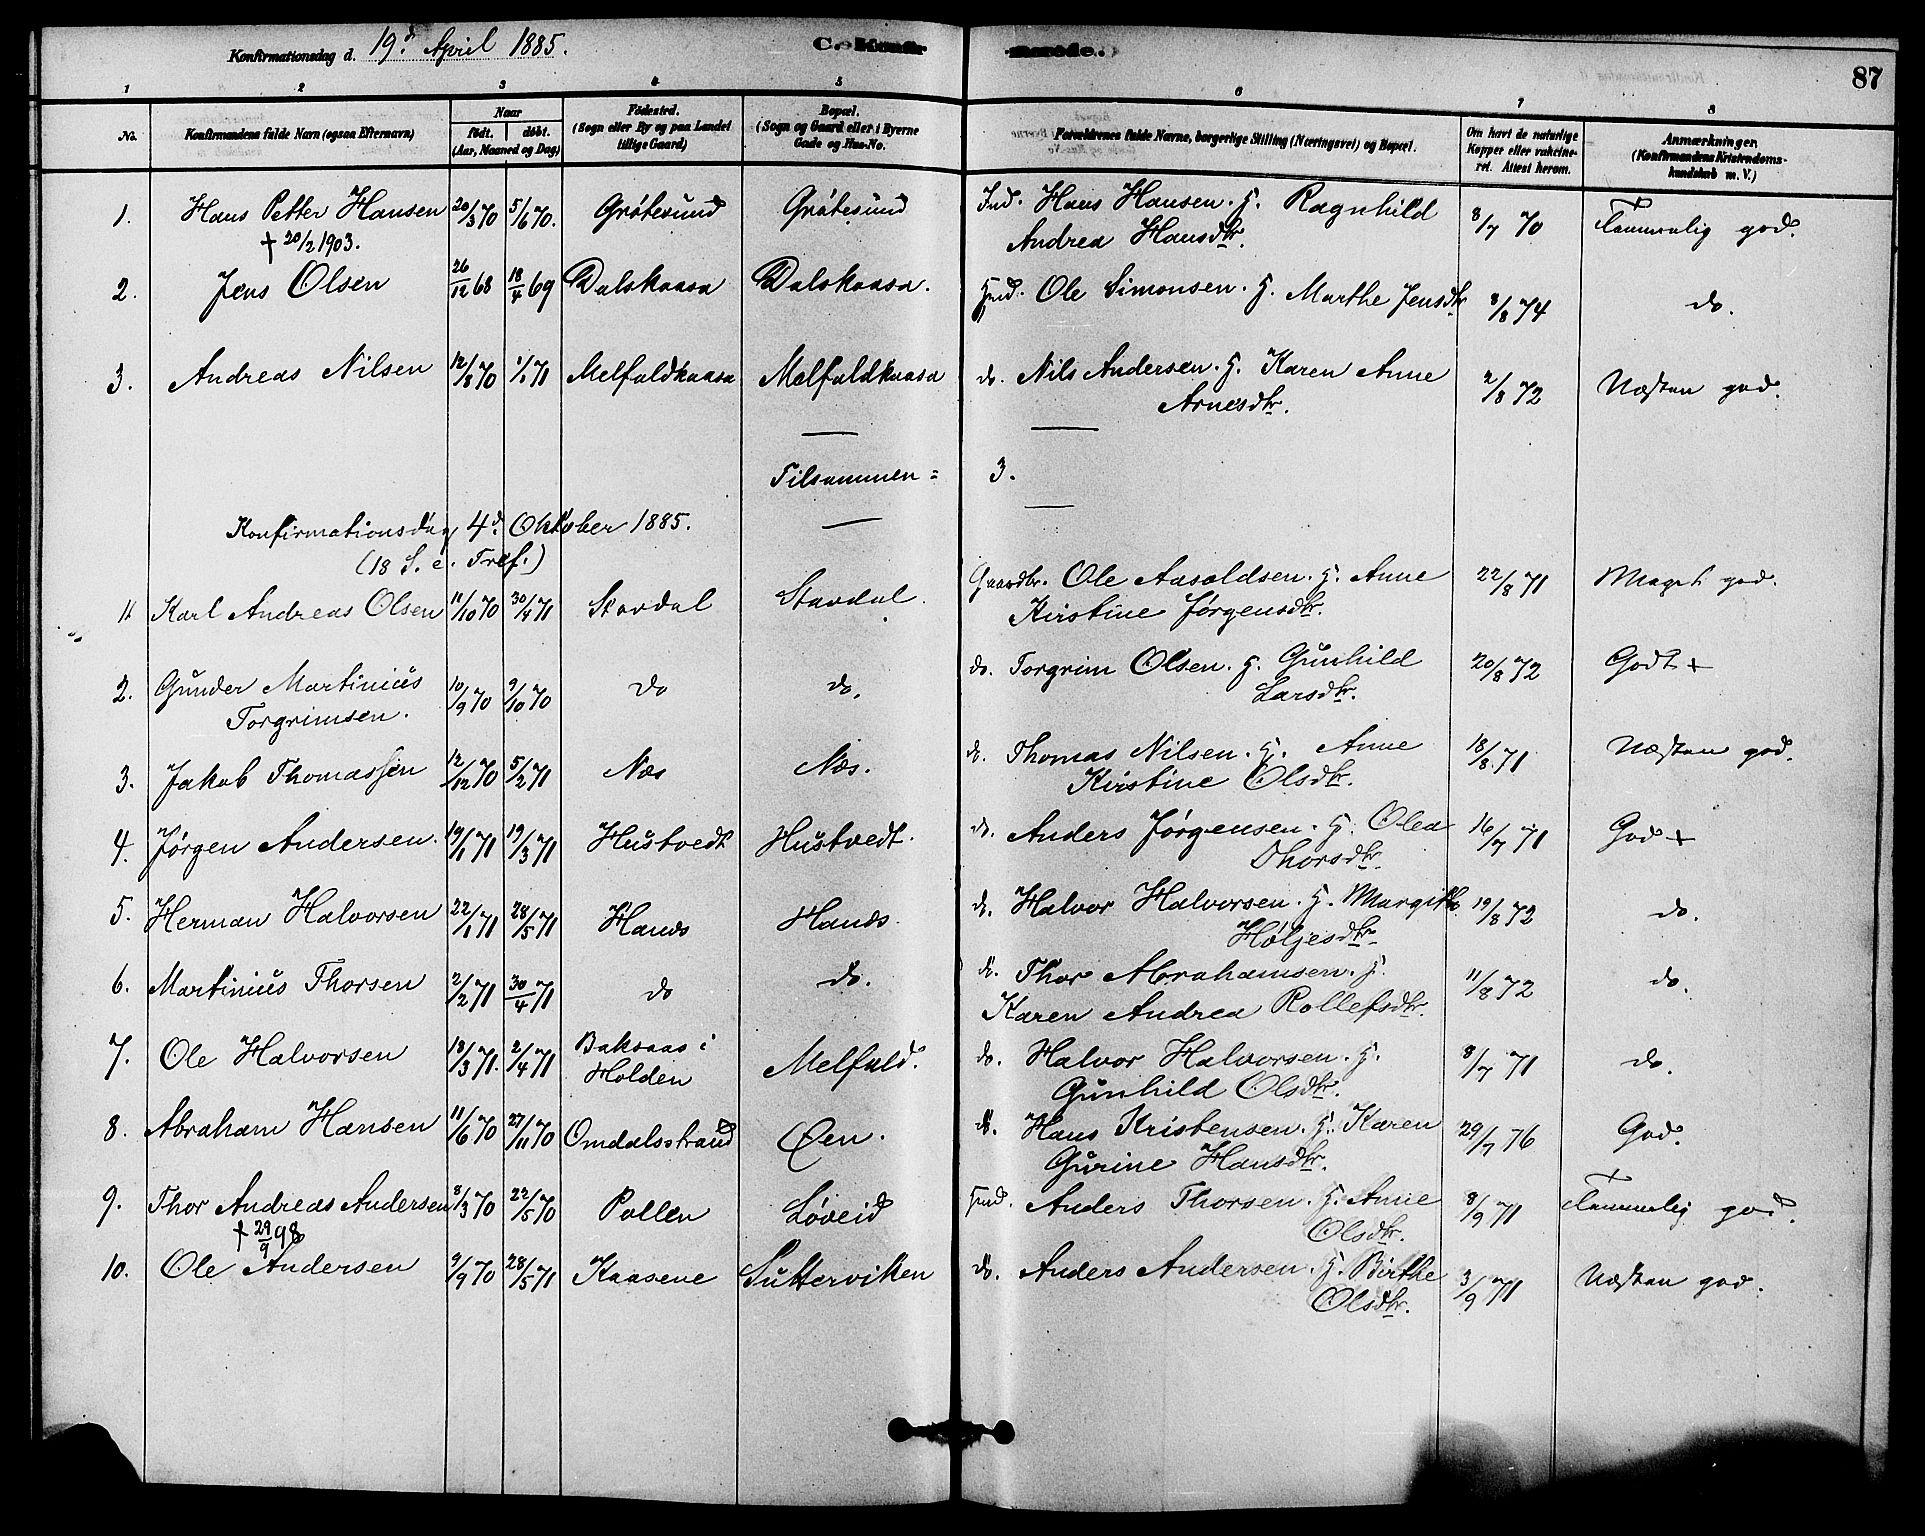 SAKO, Solum kirkebøker, F/Fb/L0001: Ministerialbok nr. II 1, 1877-1892, s. 87